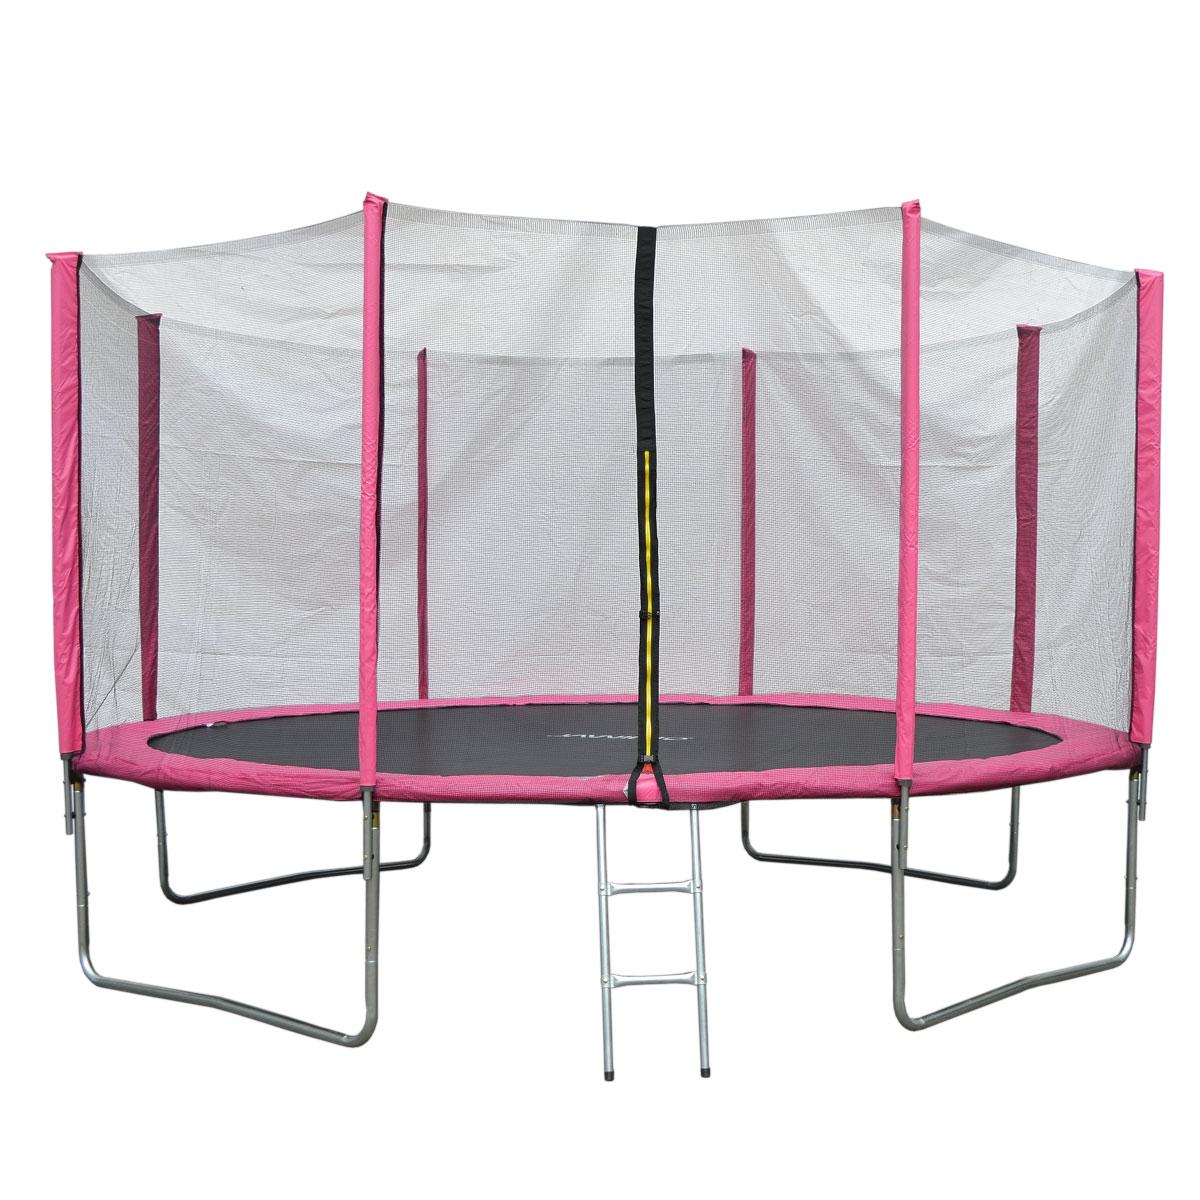 90509 JAWINIO Trampolin 427 cm Gartentrampolin Trampolin Kinder Komplettset Pink